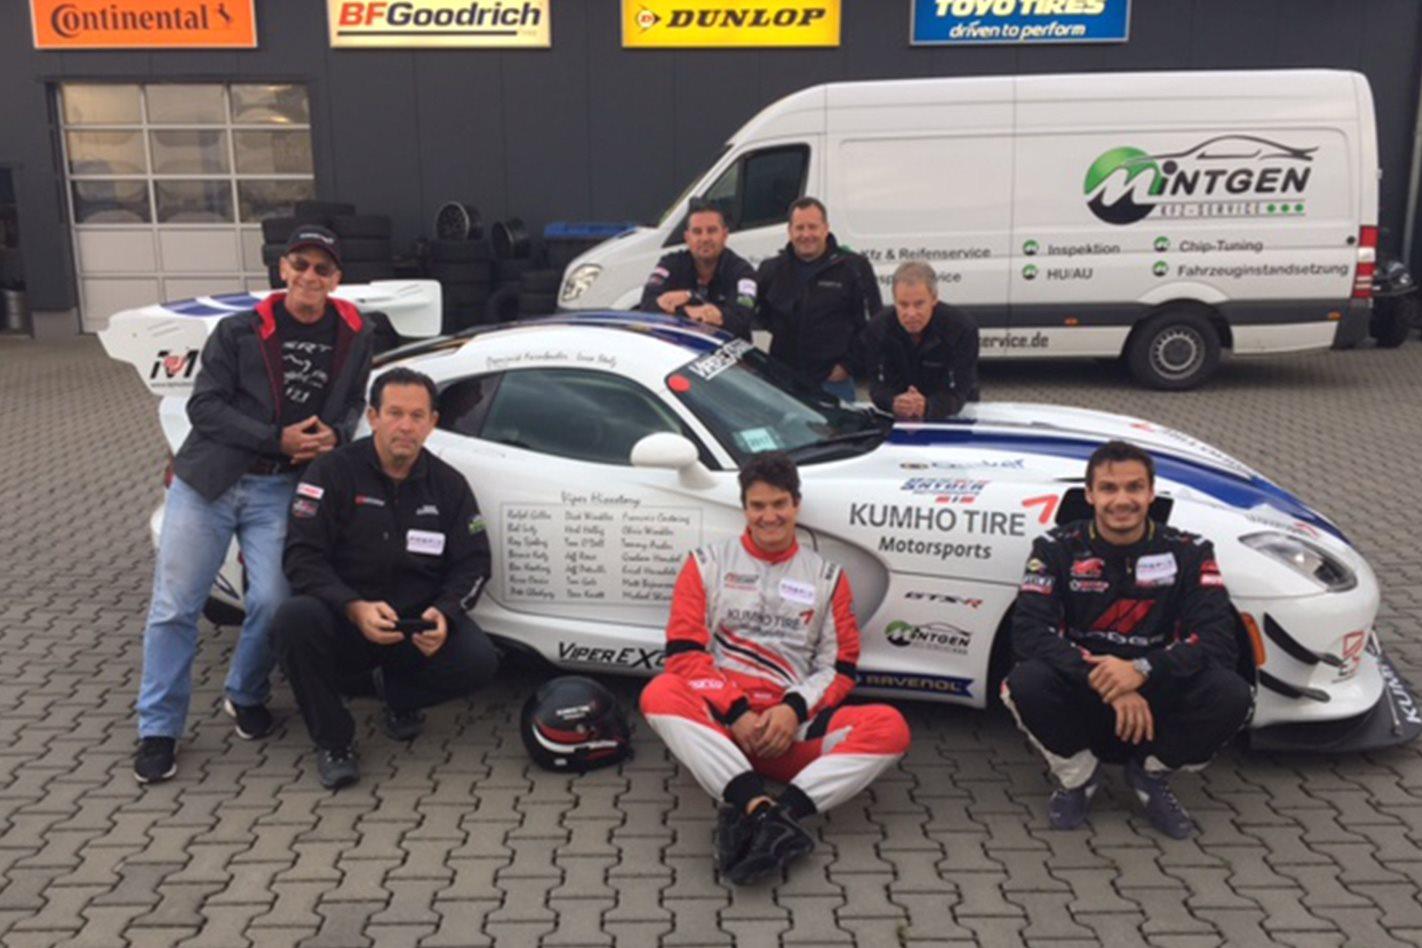 Dodge Viper ACR Nurburgring team